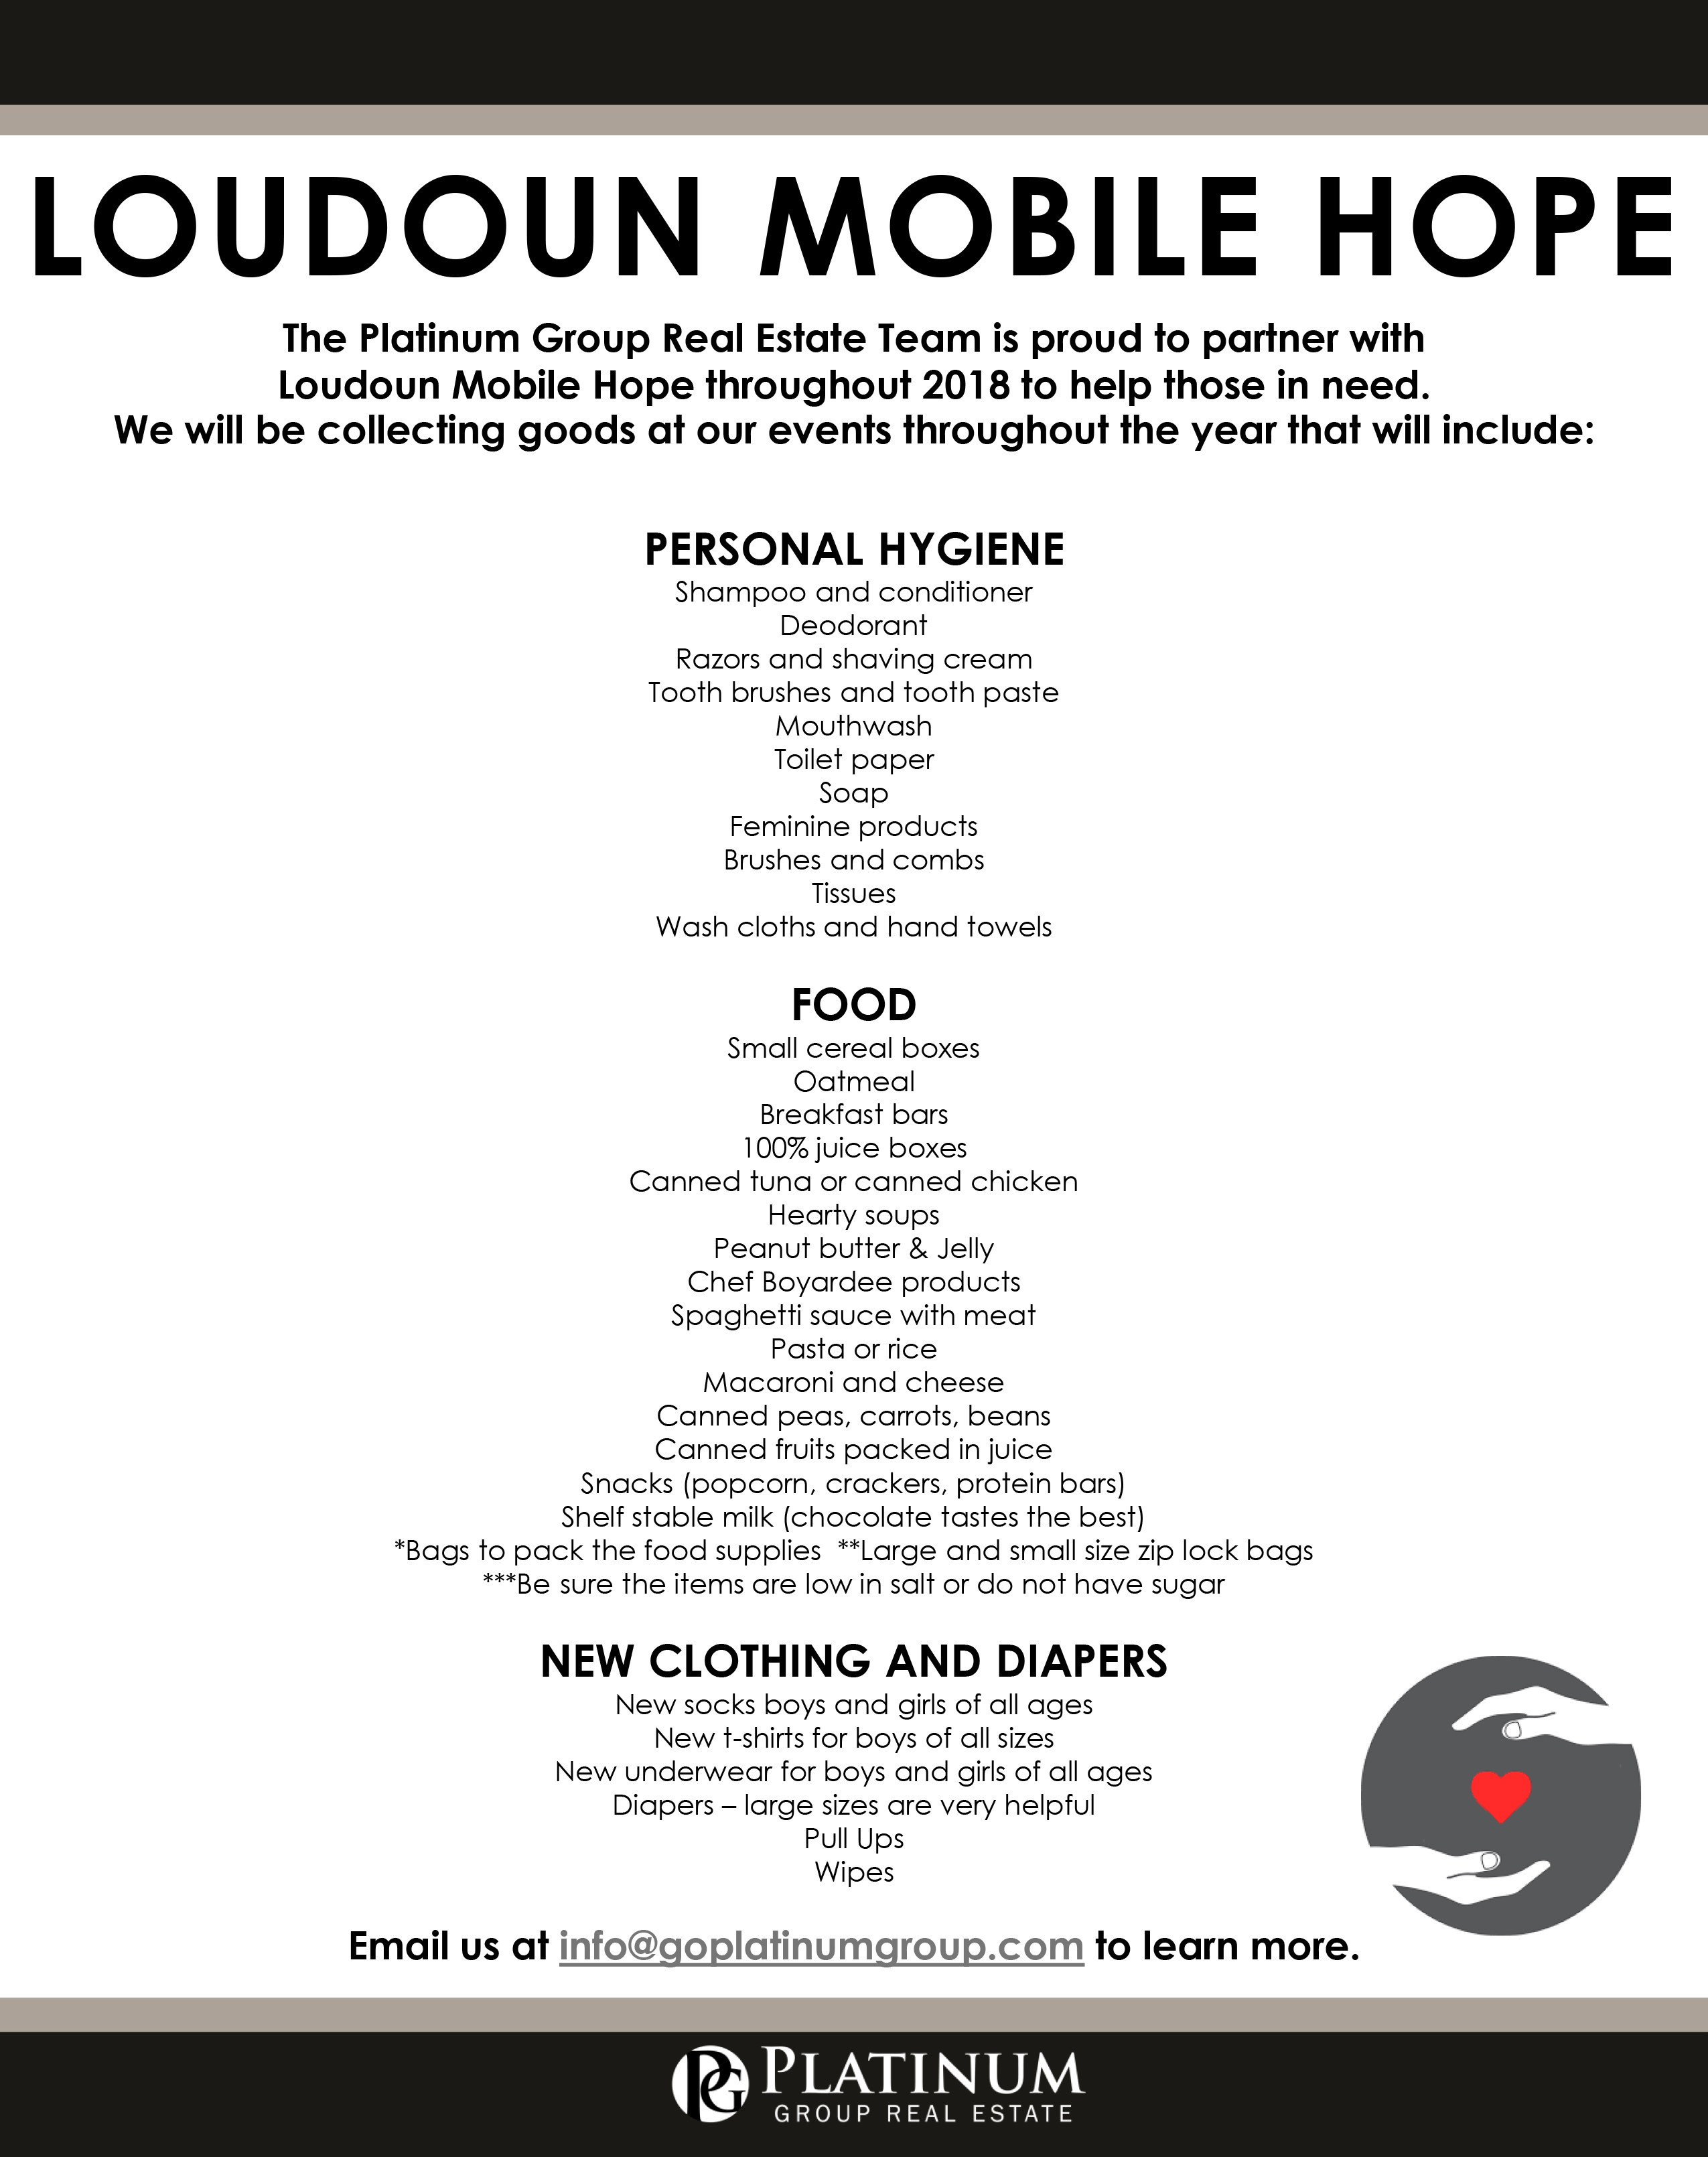 Mobile Hope